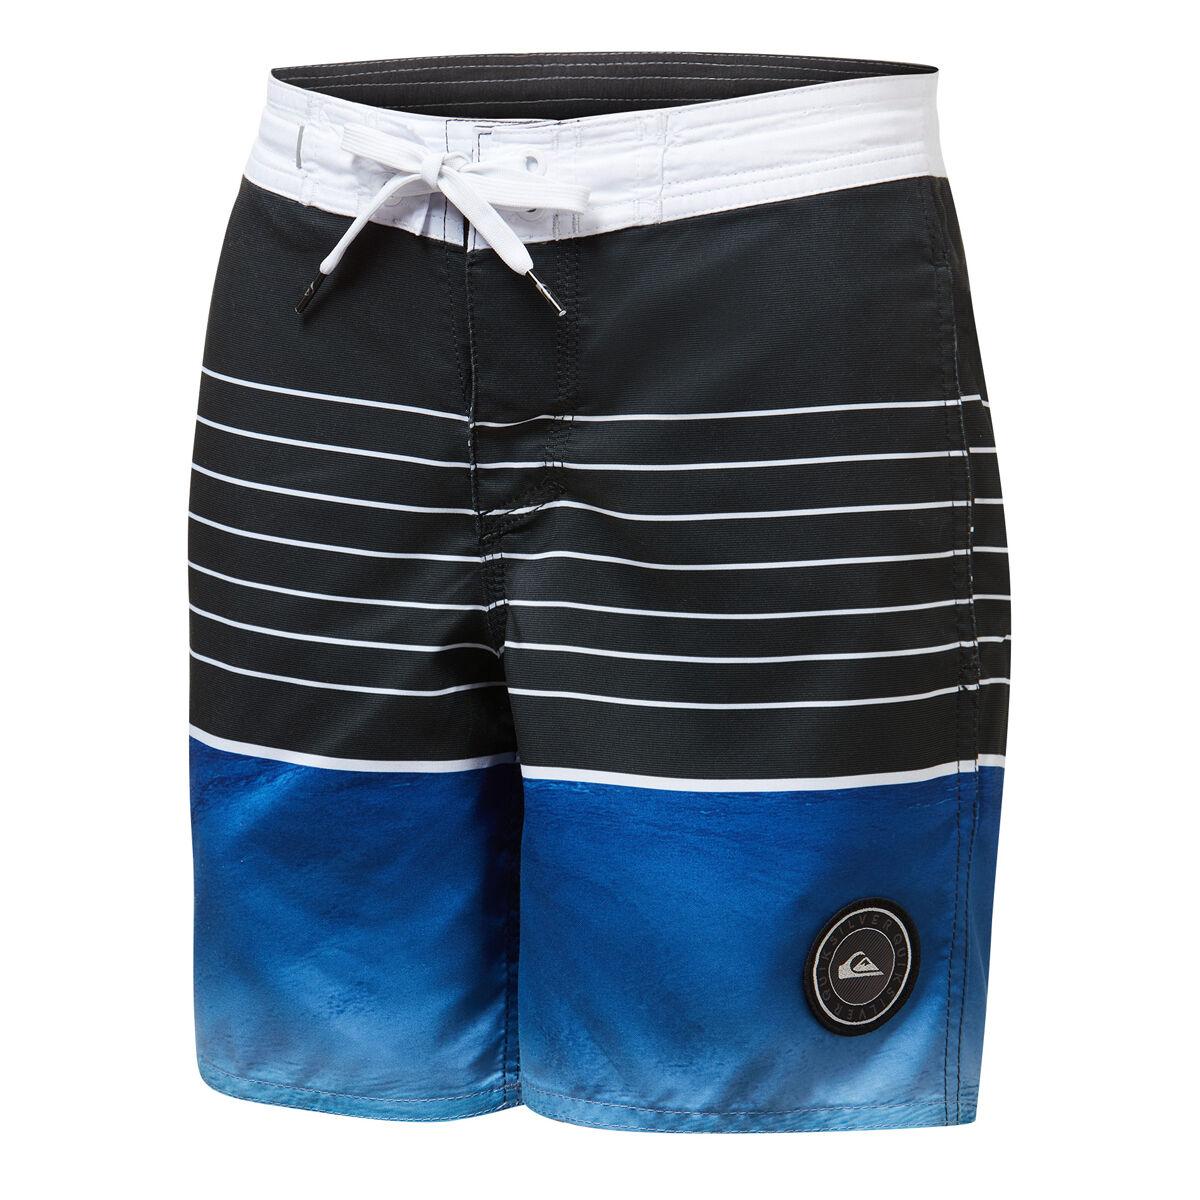 Quiksilver Boys Swell Vision Beachshort 12 Boardshort Swim Trunk